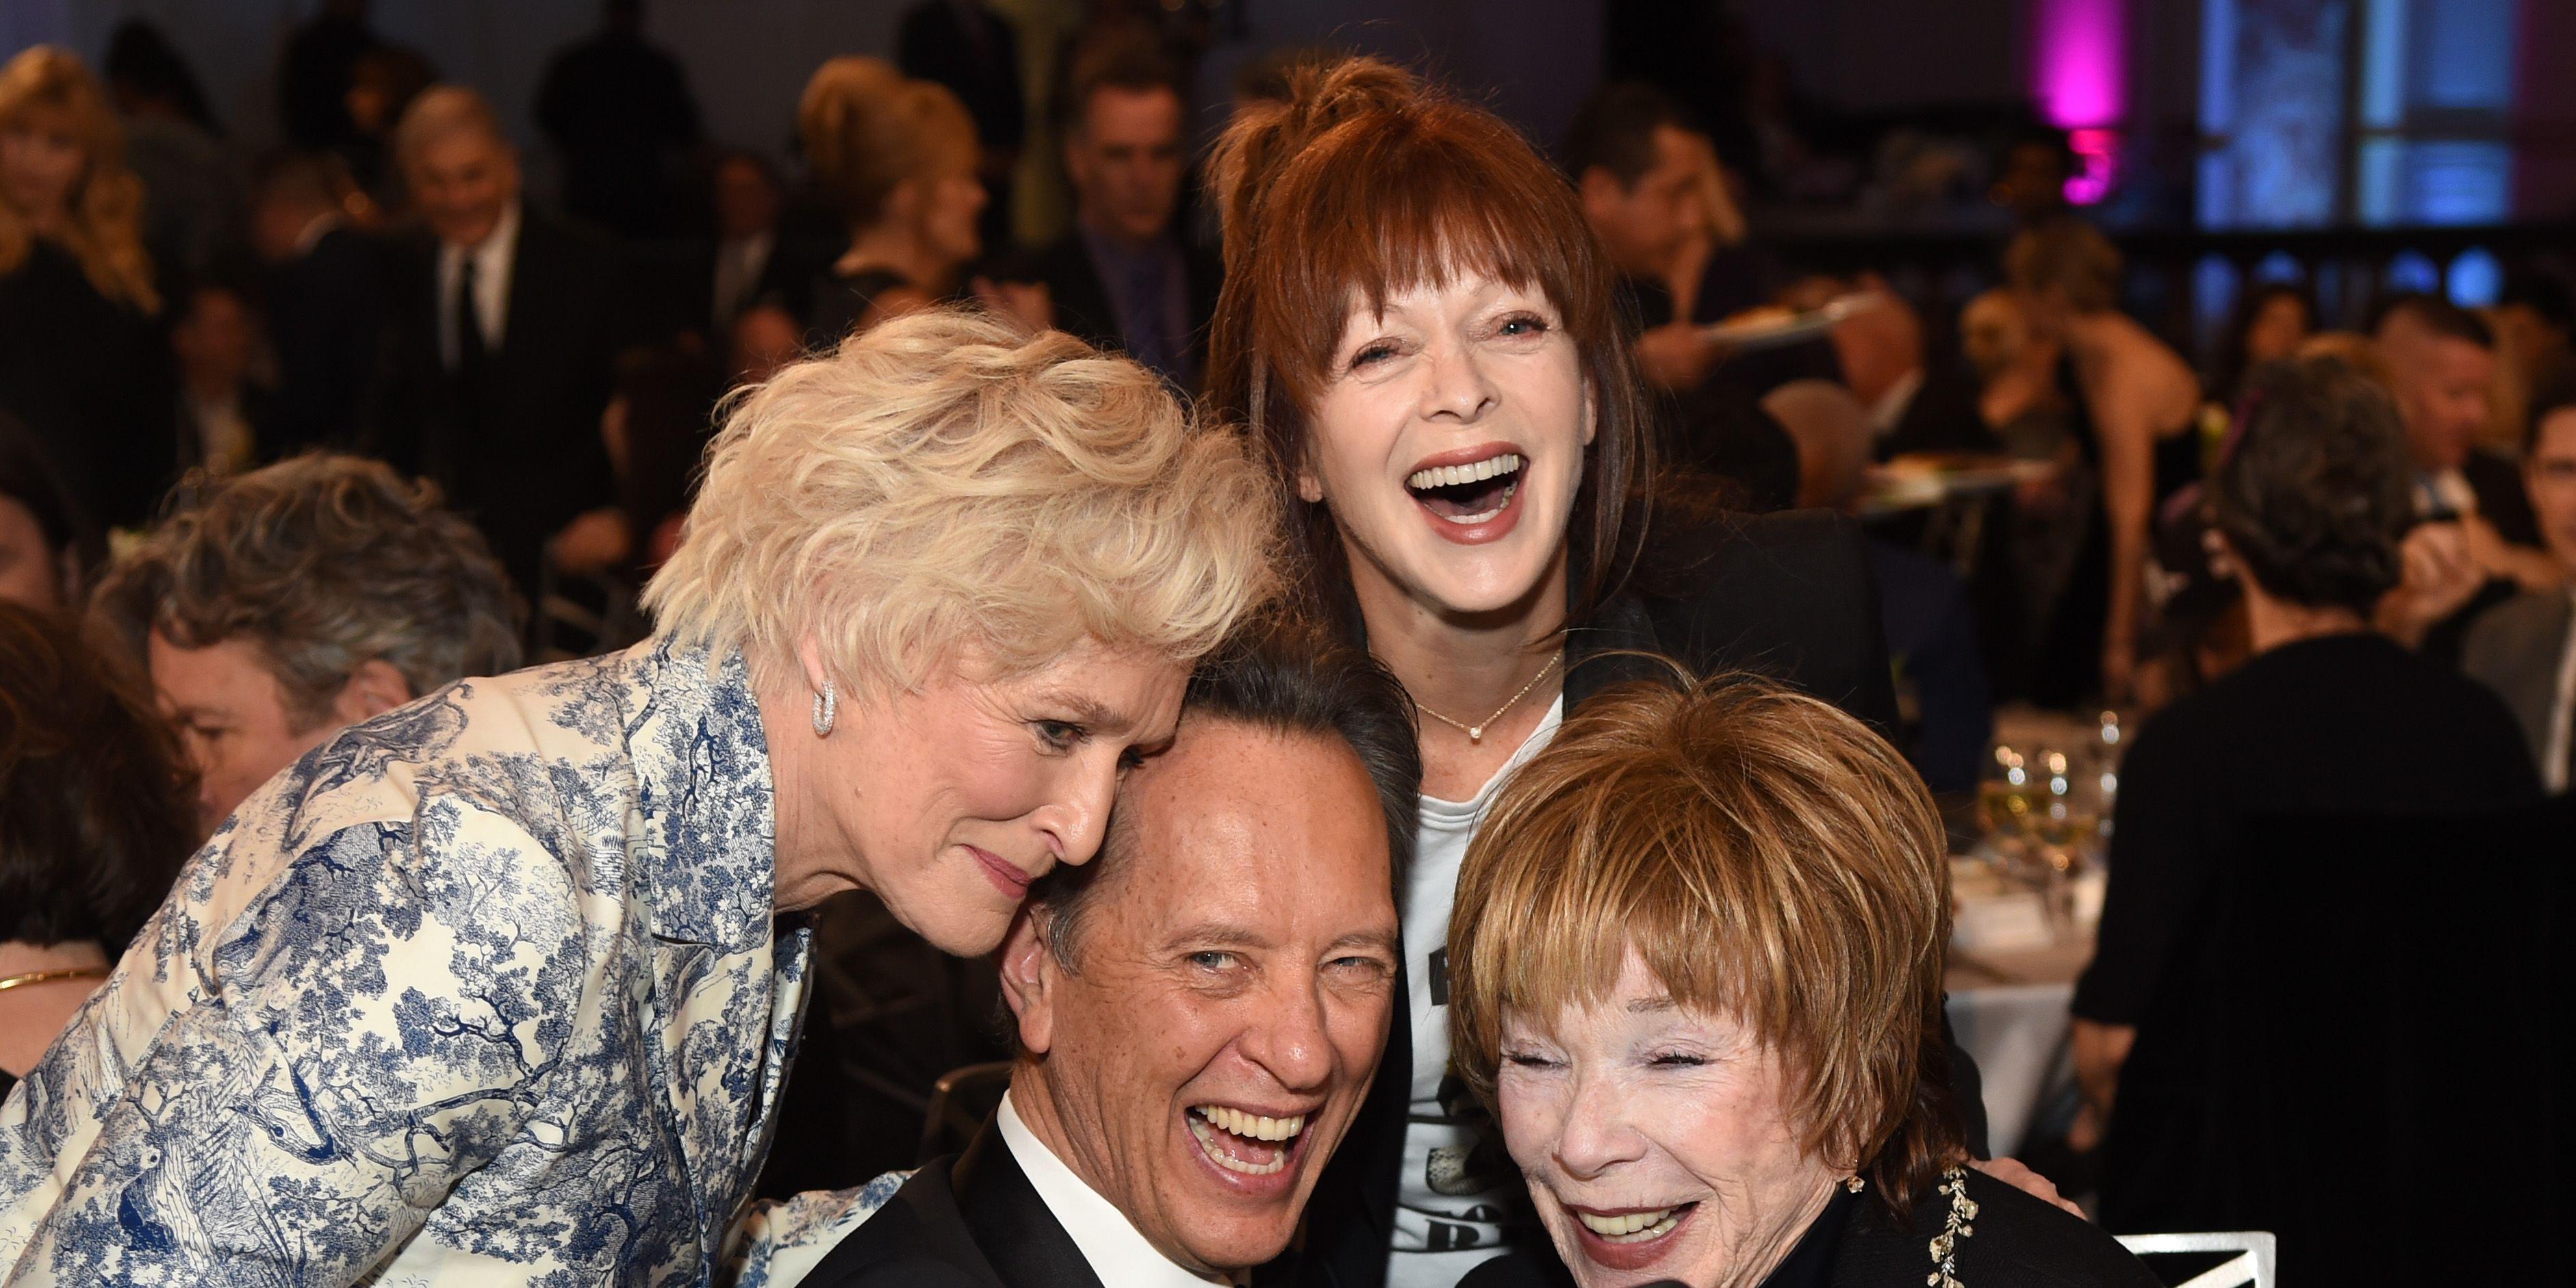 Richard E. Grant, selfies, Oscars, prijzen, awards season, Can YouEver Forgive Me, nominatie, Barbra Streisand